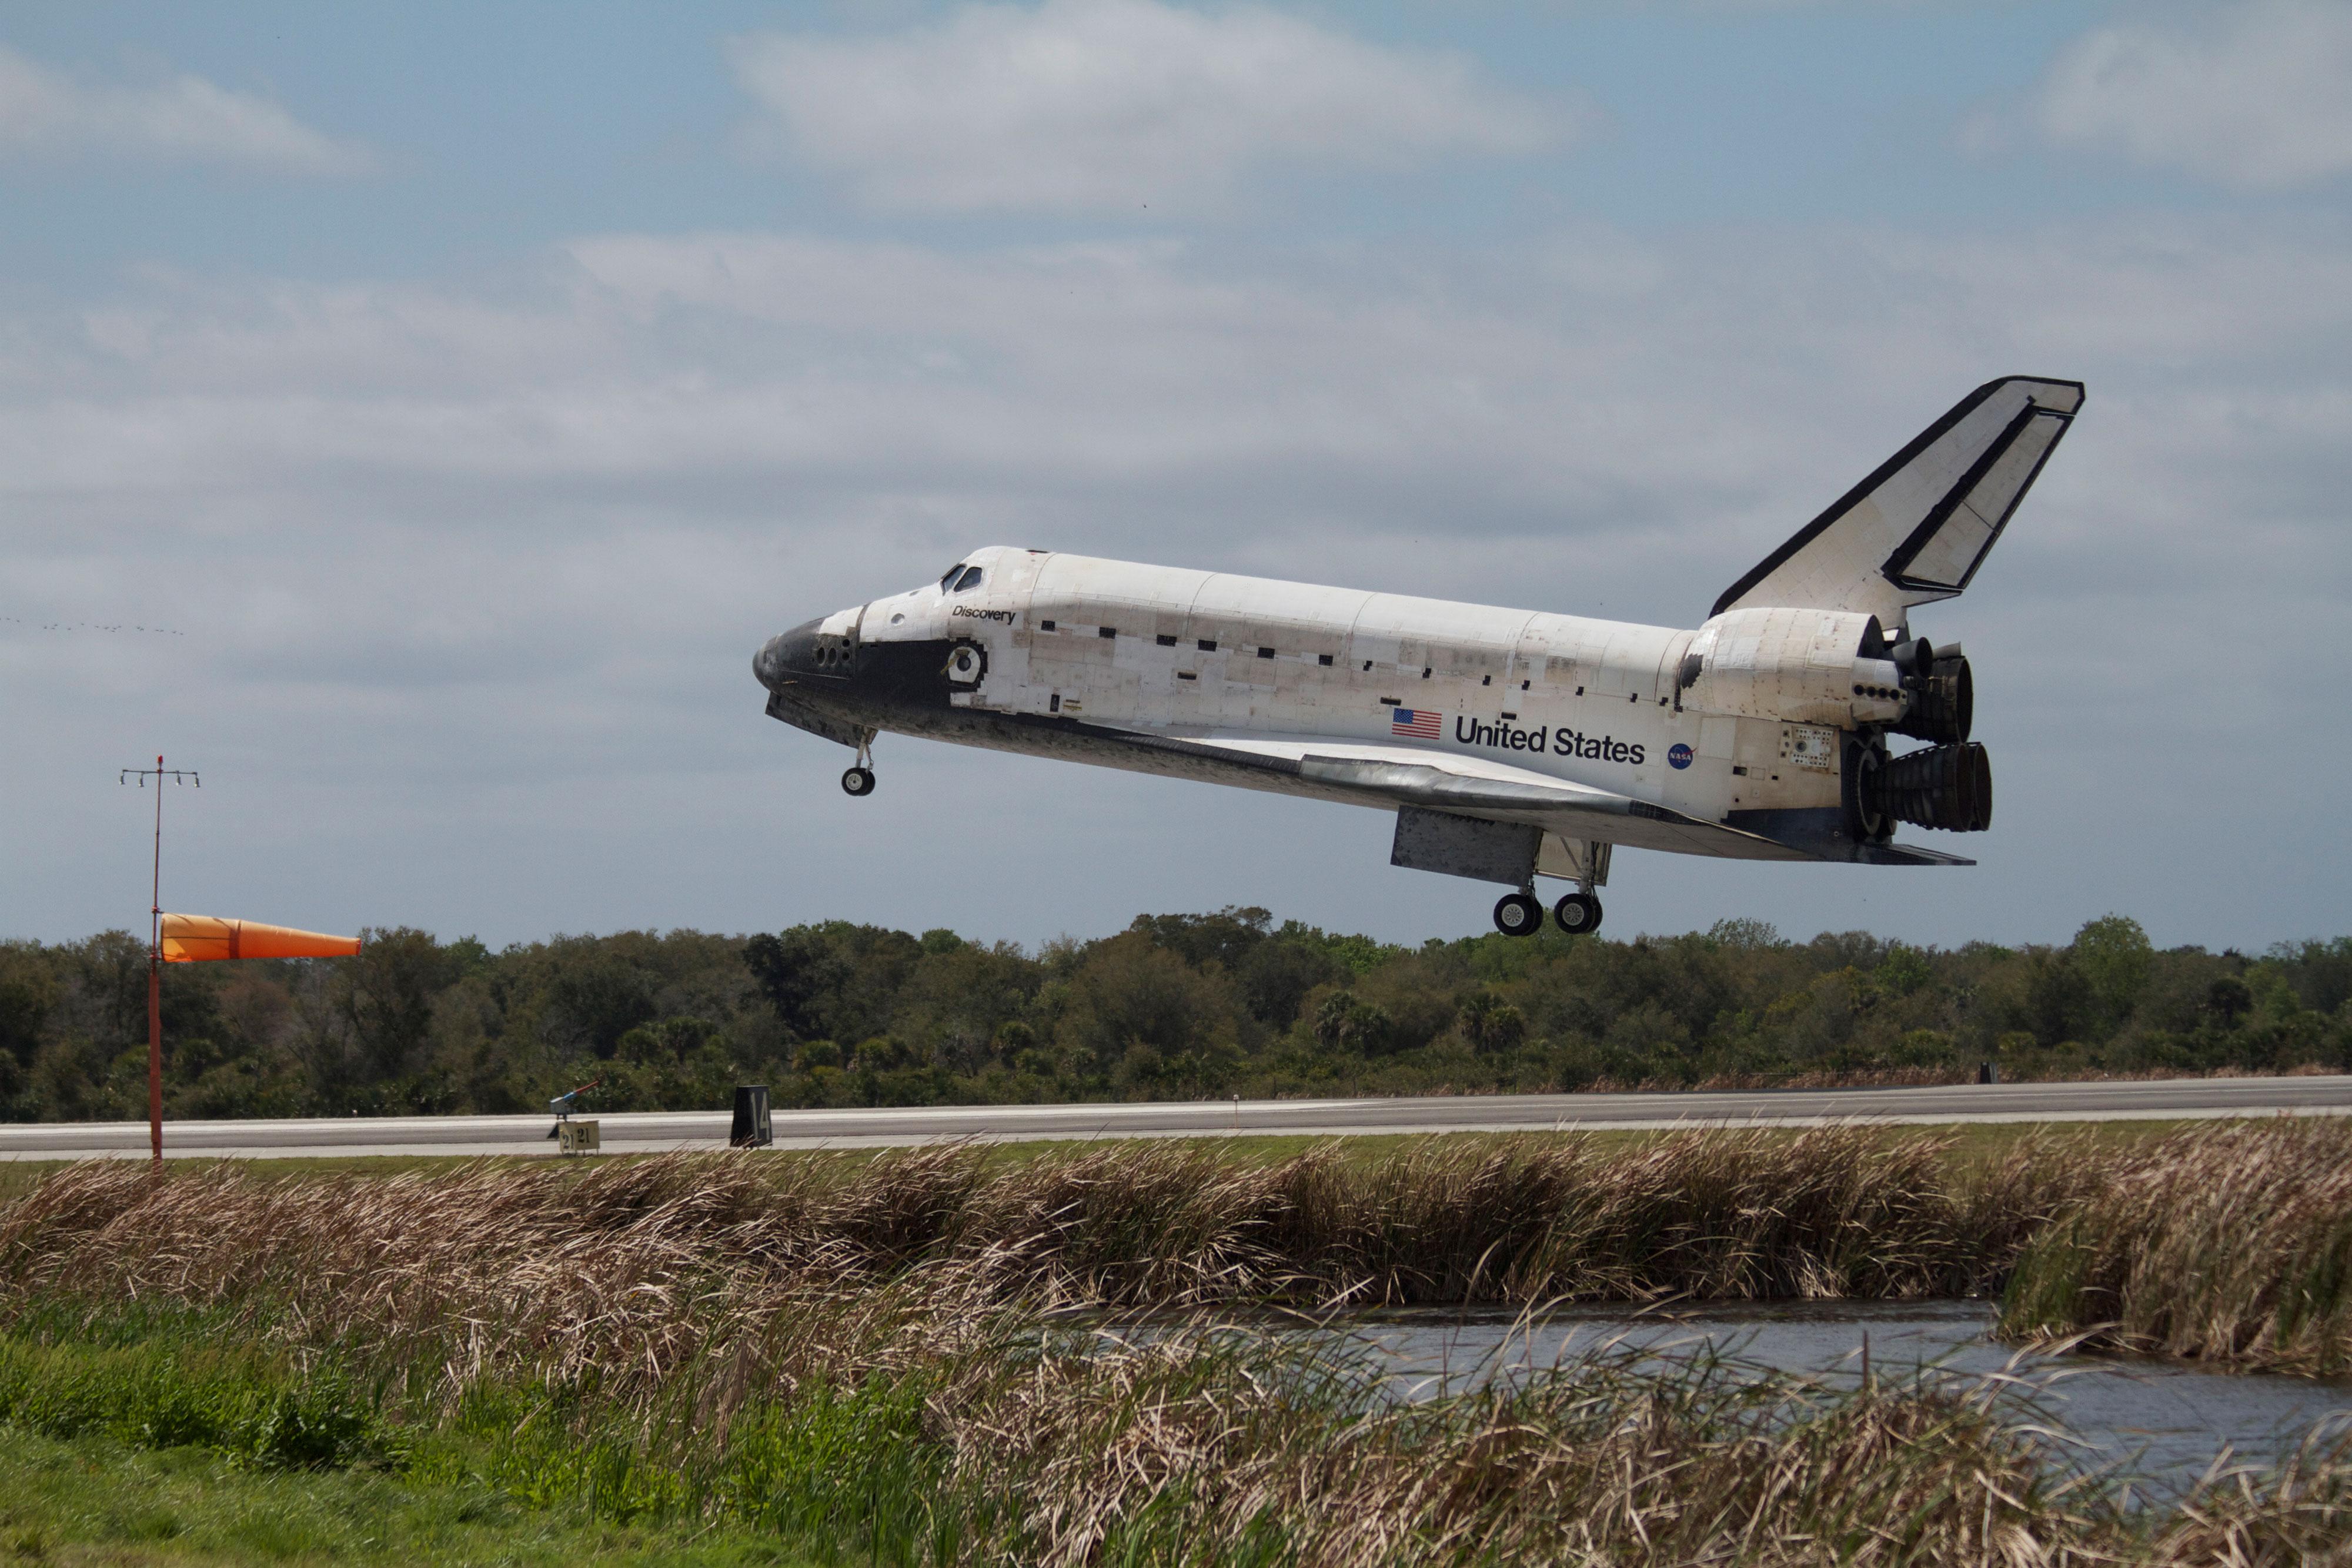 space shuttle fleet - photo #31